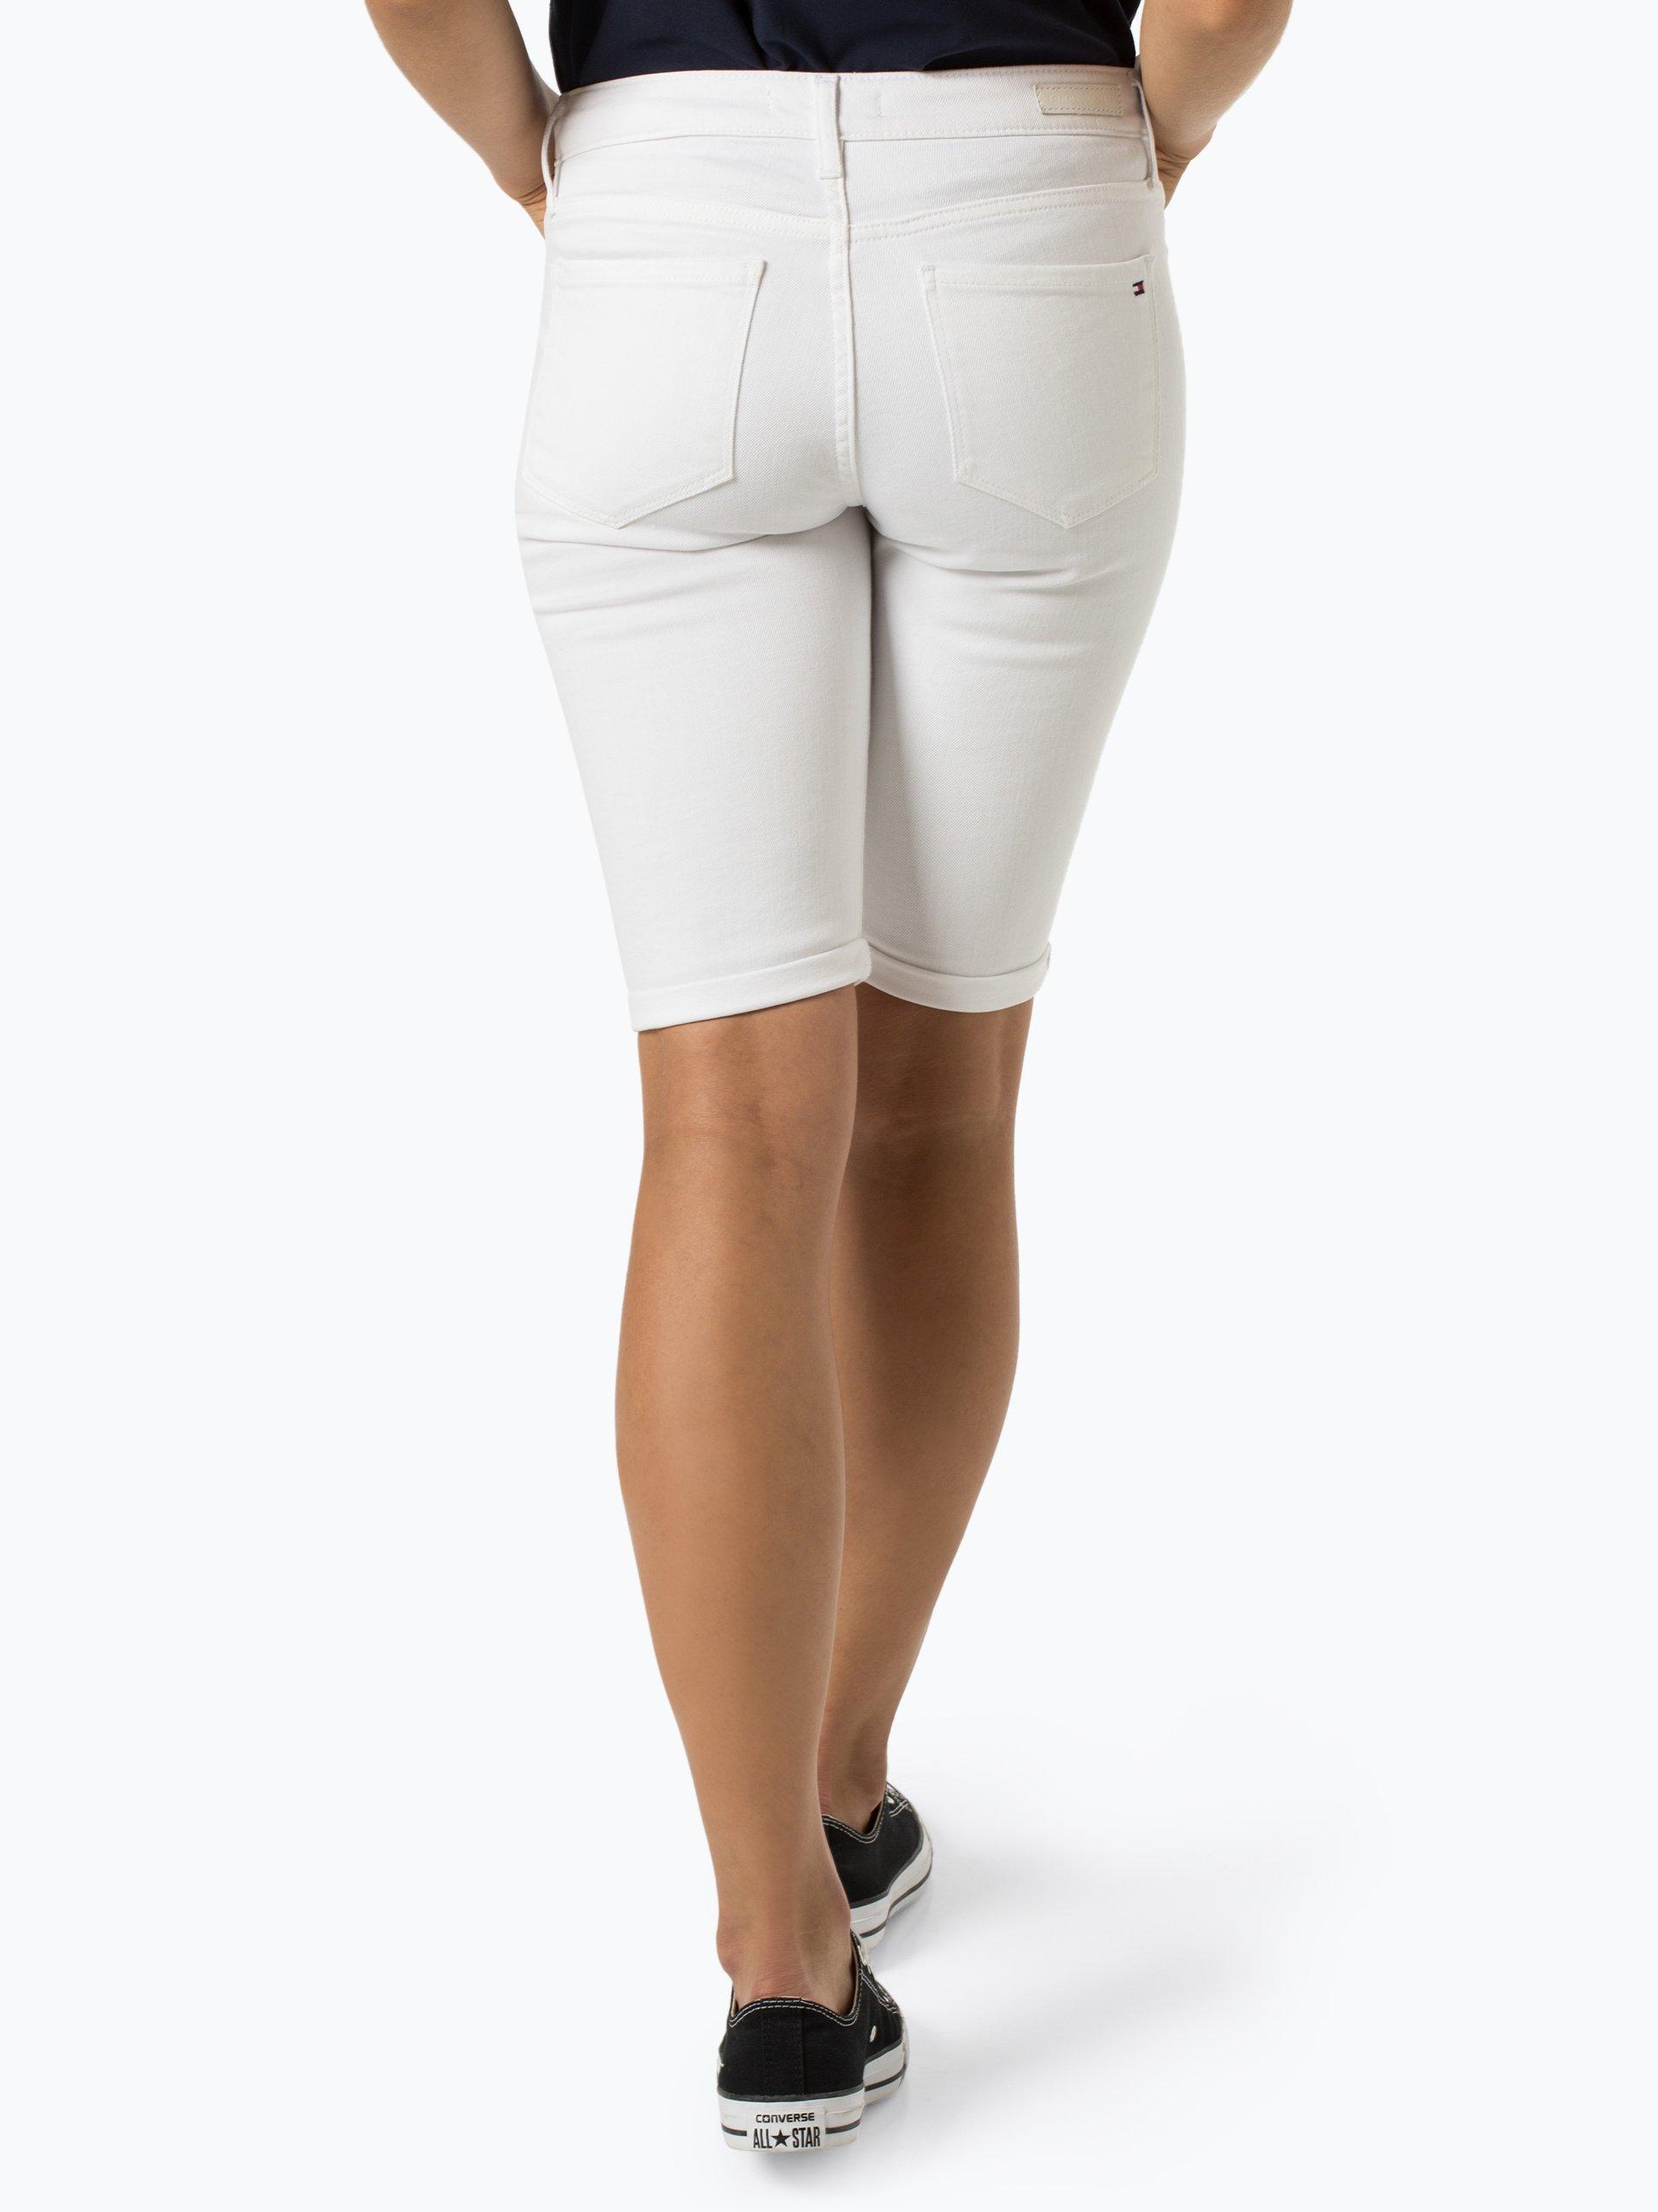 Tommy Hilfiger Damen Jeansshorts